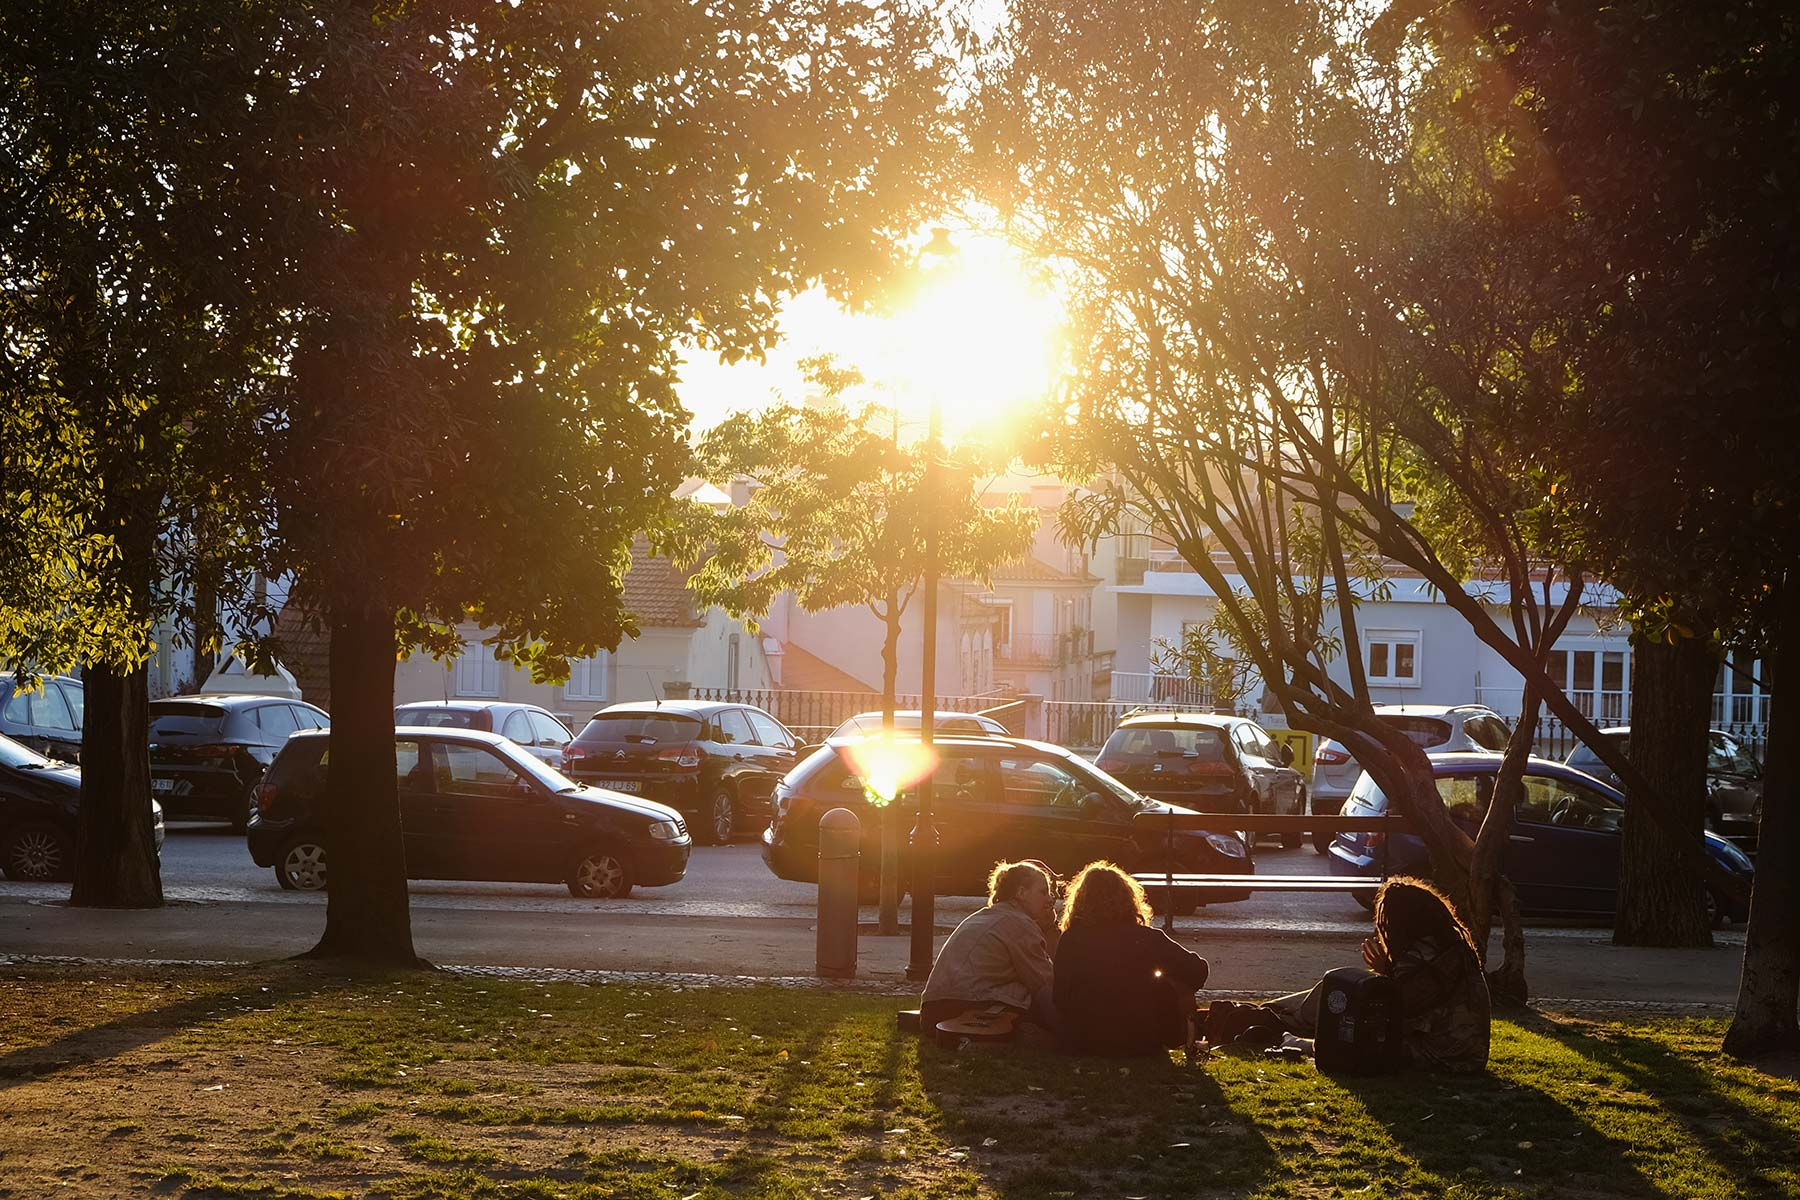 Sonnenuntergang in Lissabon, Portugal